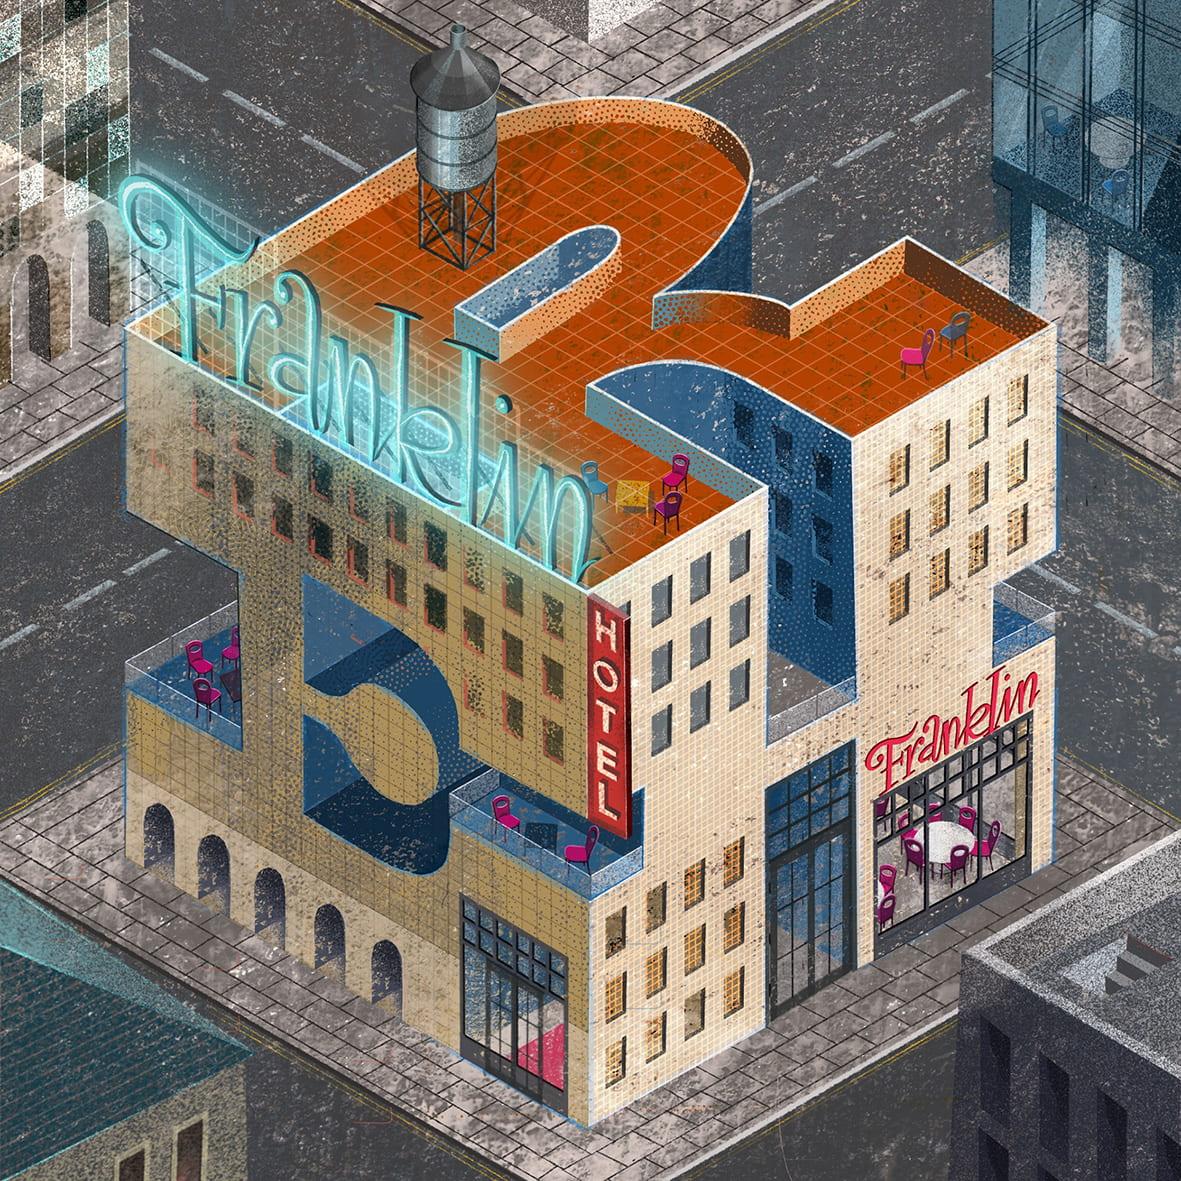 2. Franklin Hotel: Slab Serif City project, personal work